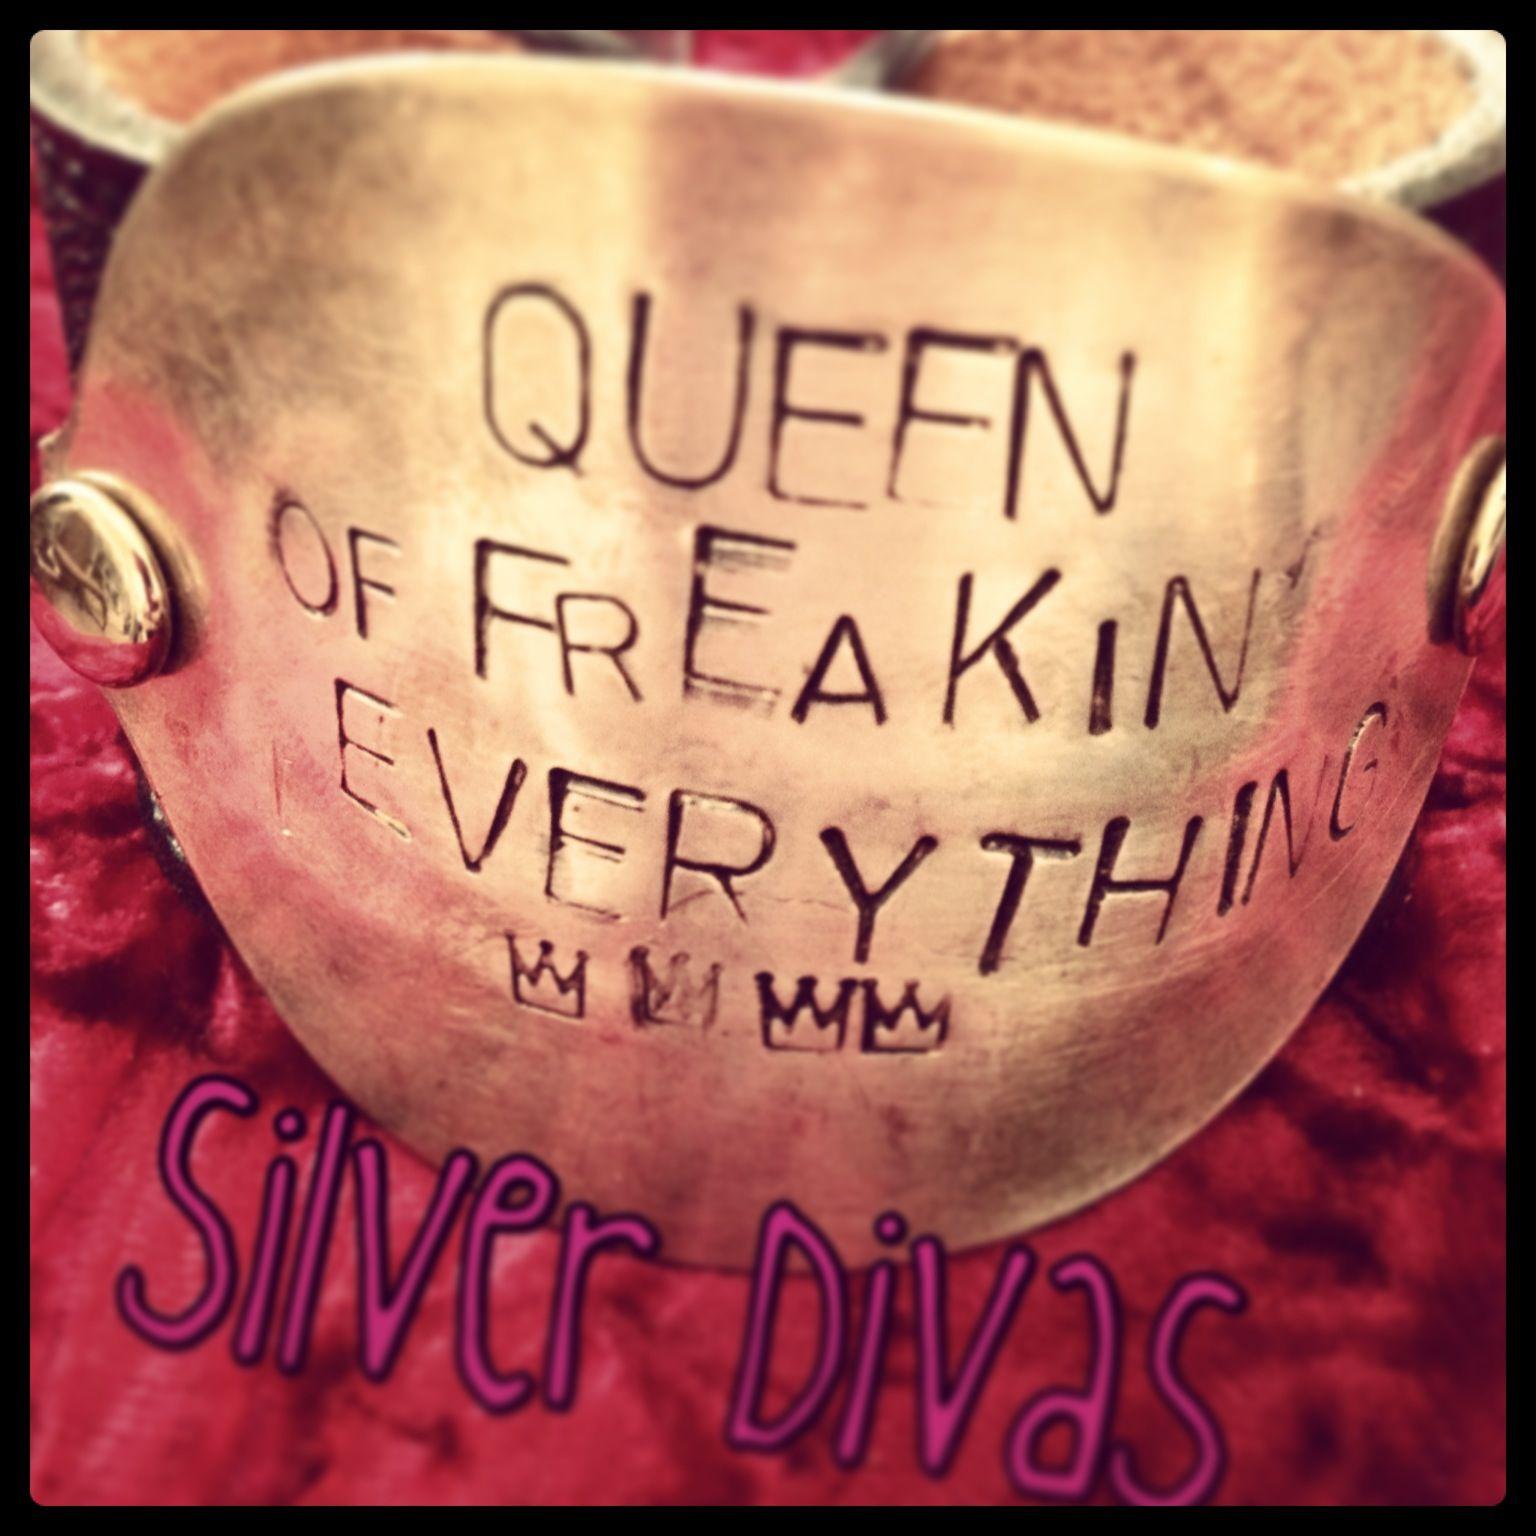 Queen of freakin everything vintage spoon and recycled western belt bracelet $30. Find us on Facebook!